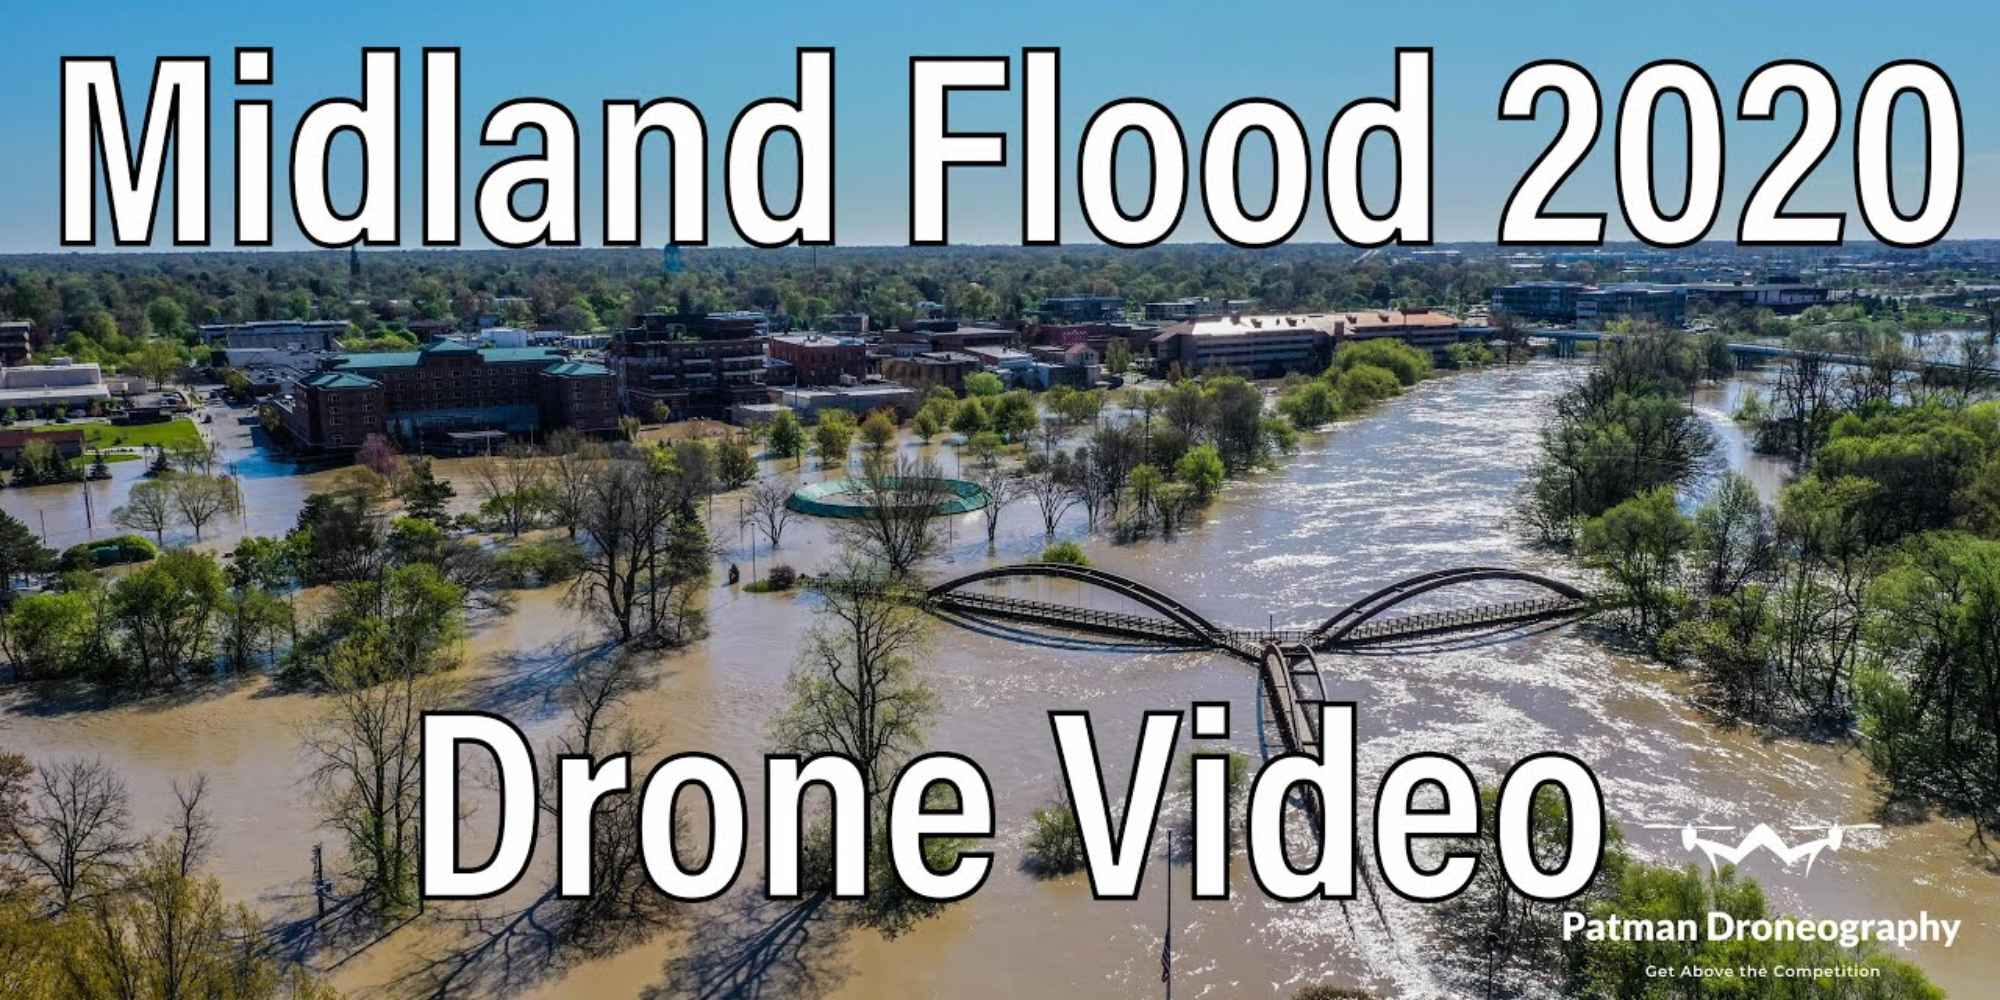 drone x pro official site